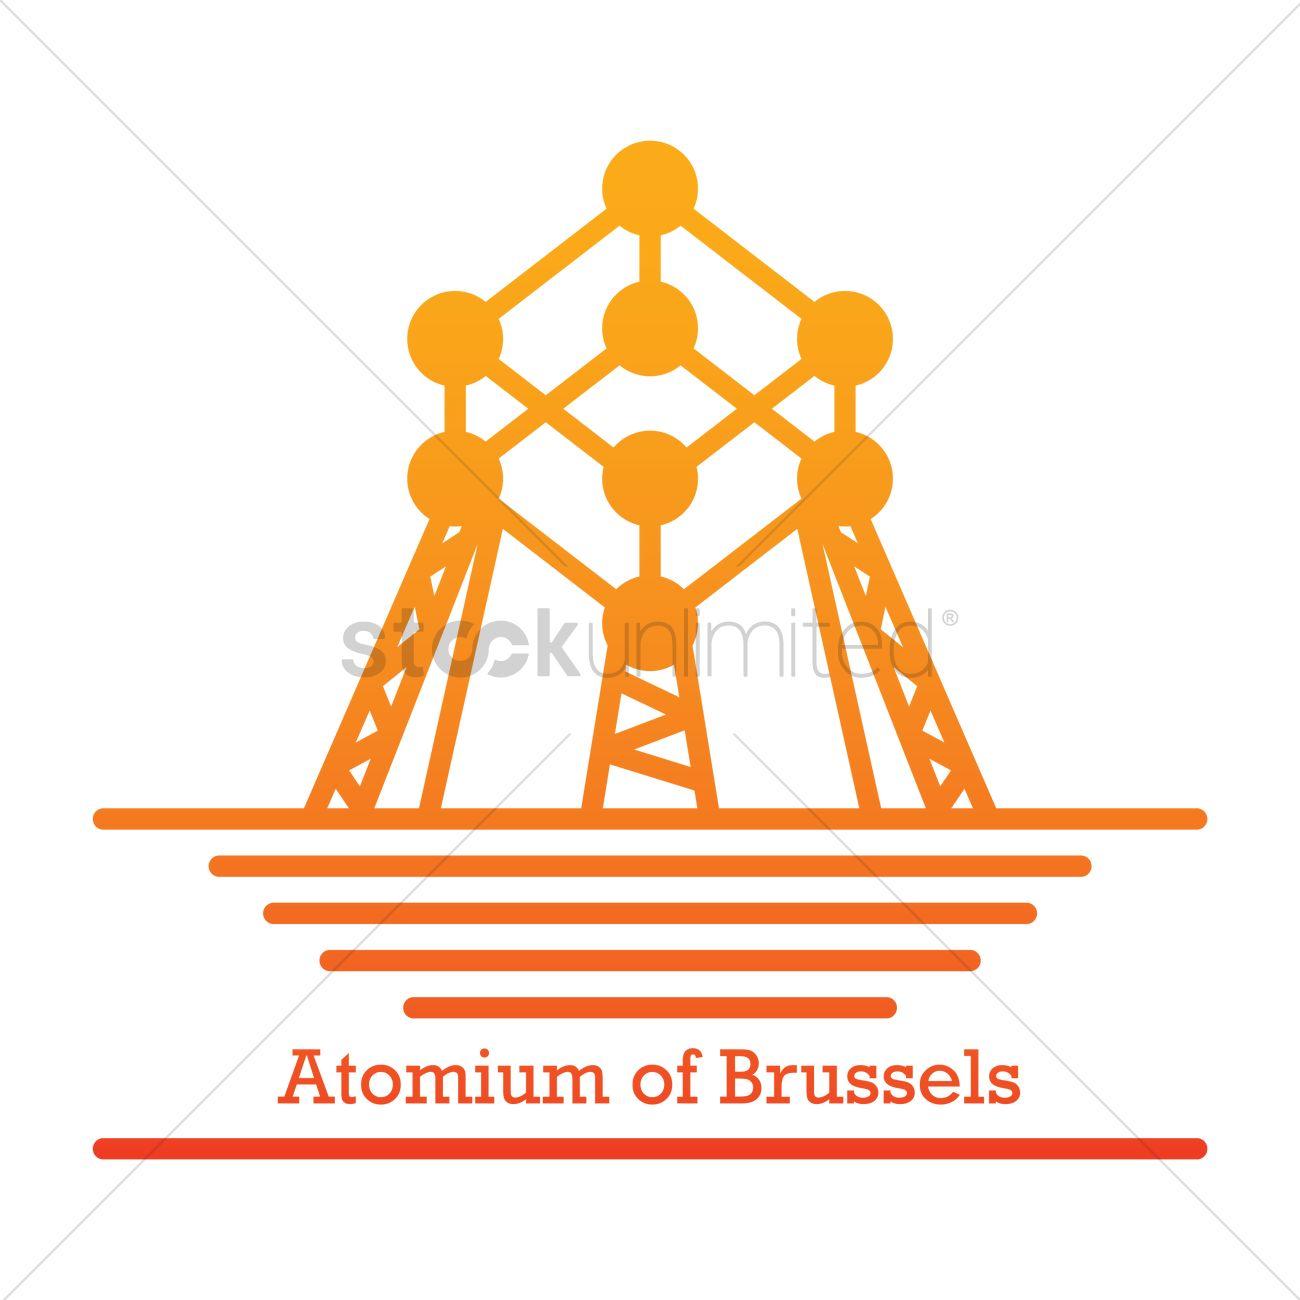 Atomium of brussels Vector Image.